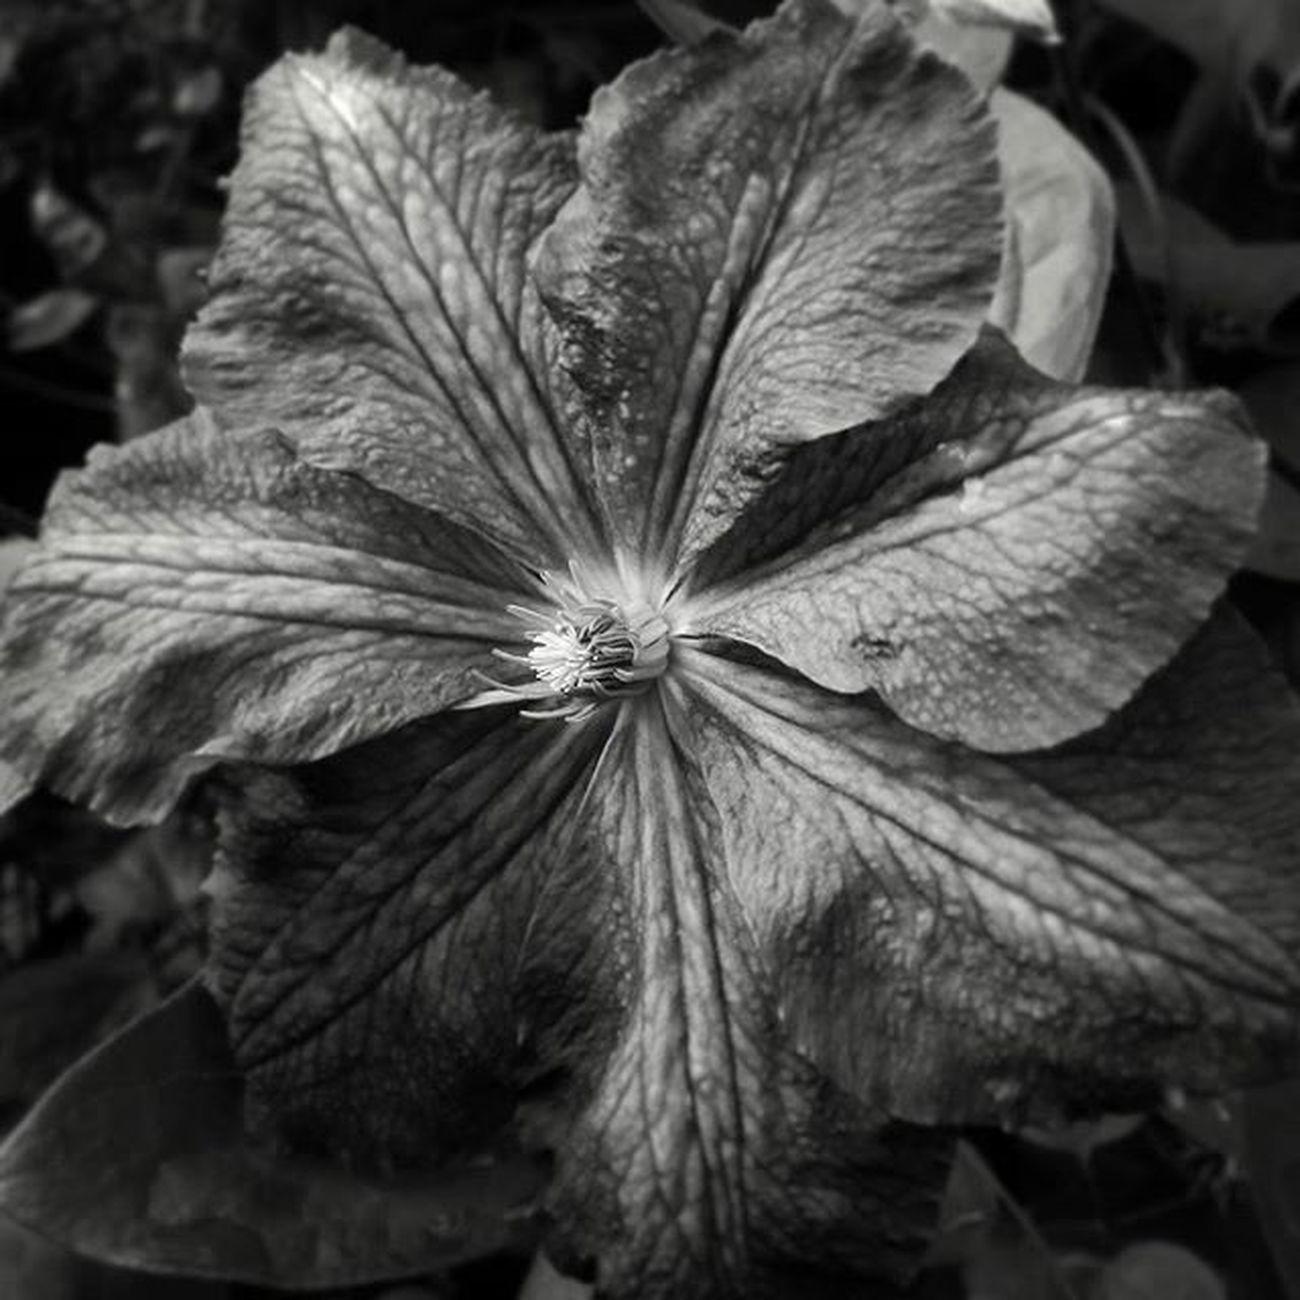 Blackandwhite Flowercloseup Flowerperfection Naturelovers nature natural natureperfection